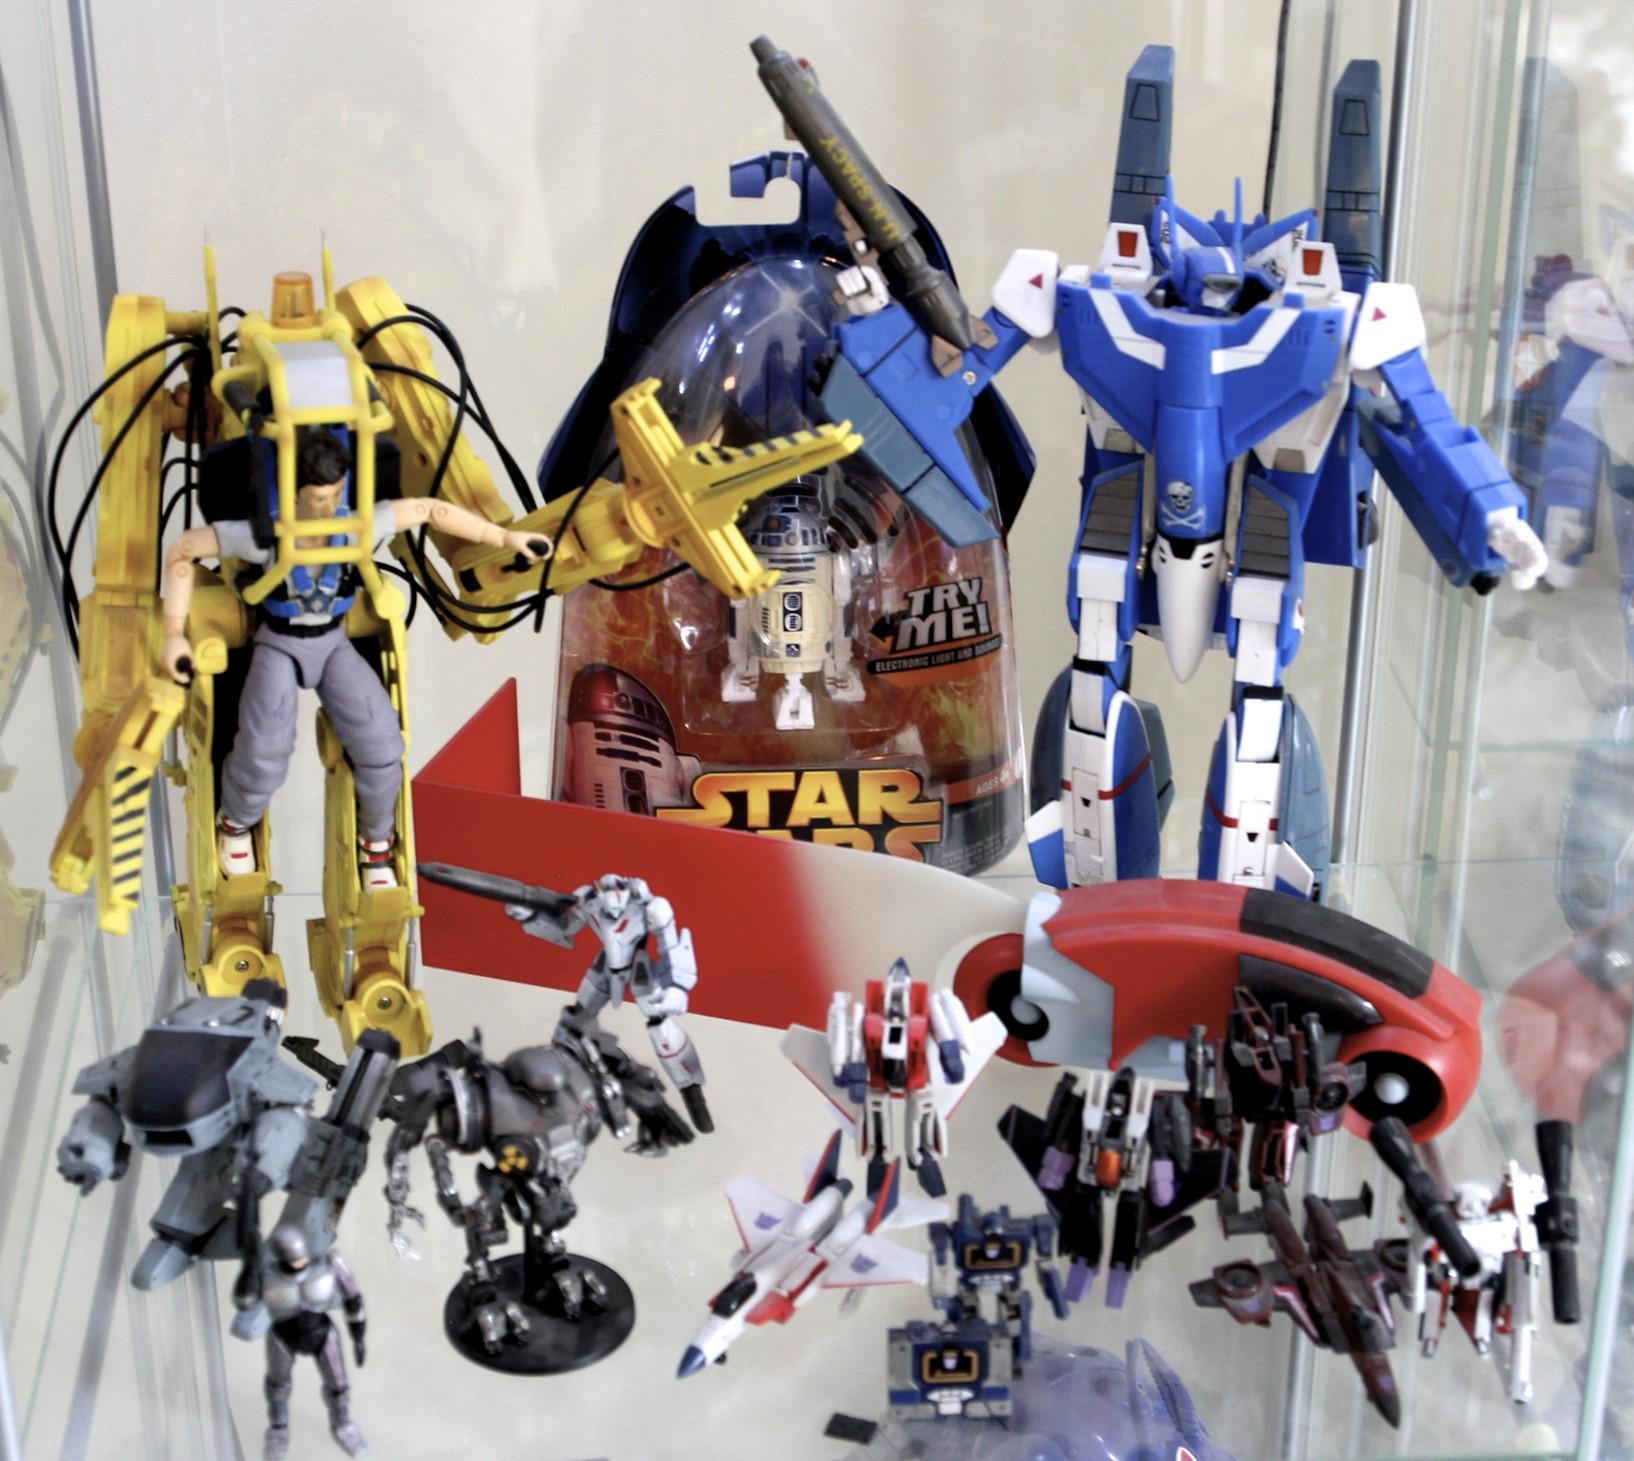 Robotic  Veritechs,  Aliens  Power Loader, Robocop, R2-D2,  TRON  Light Cycle, Mini Transformers